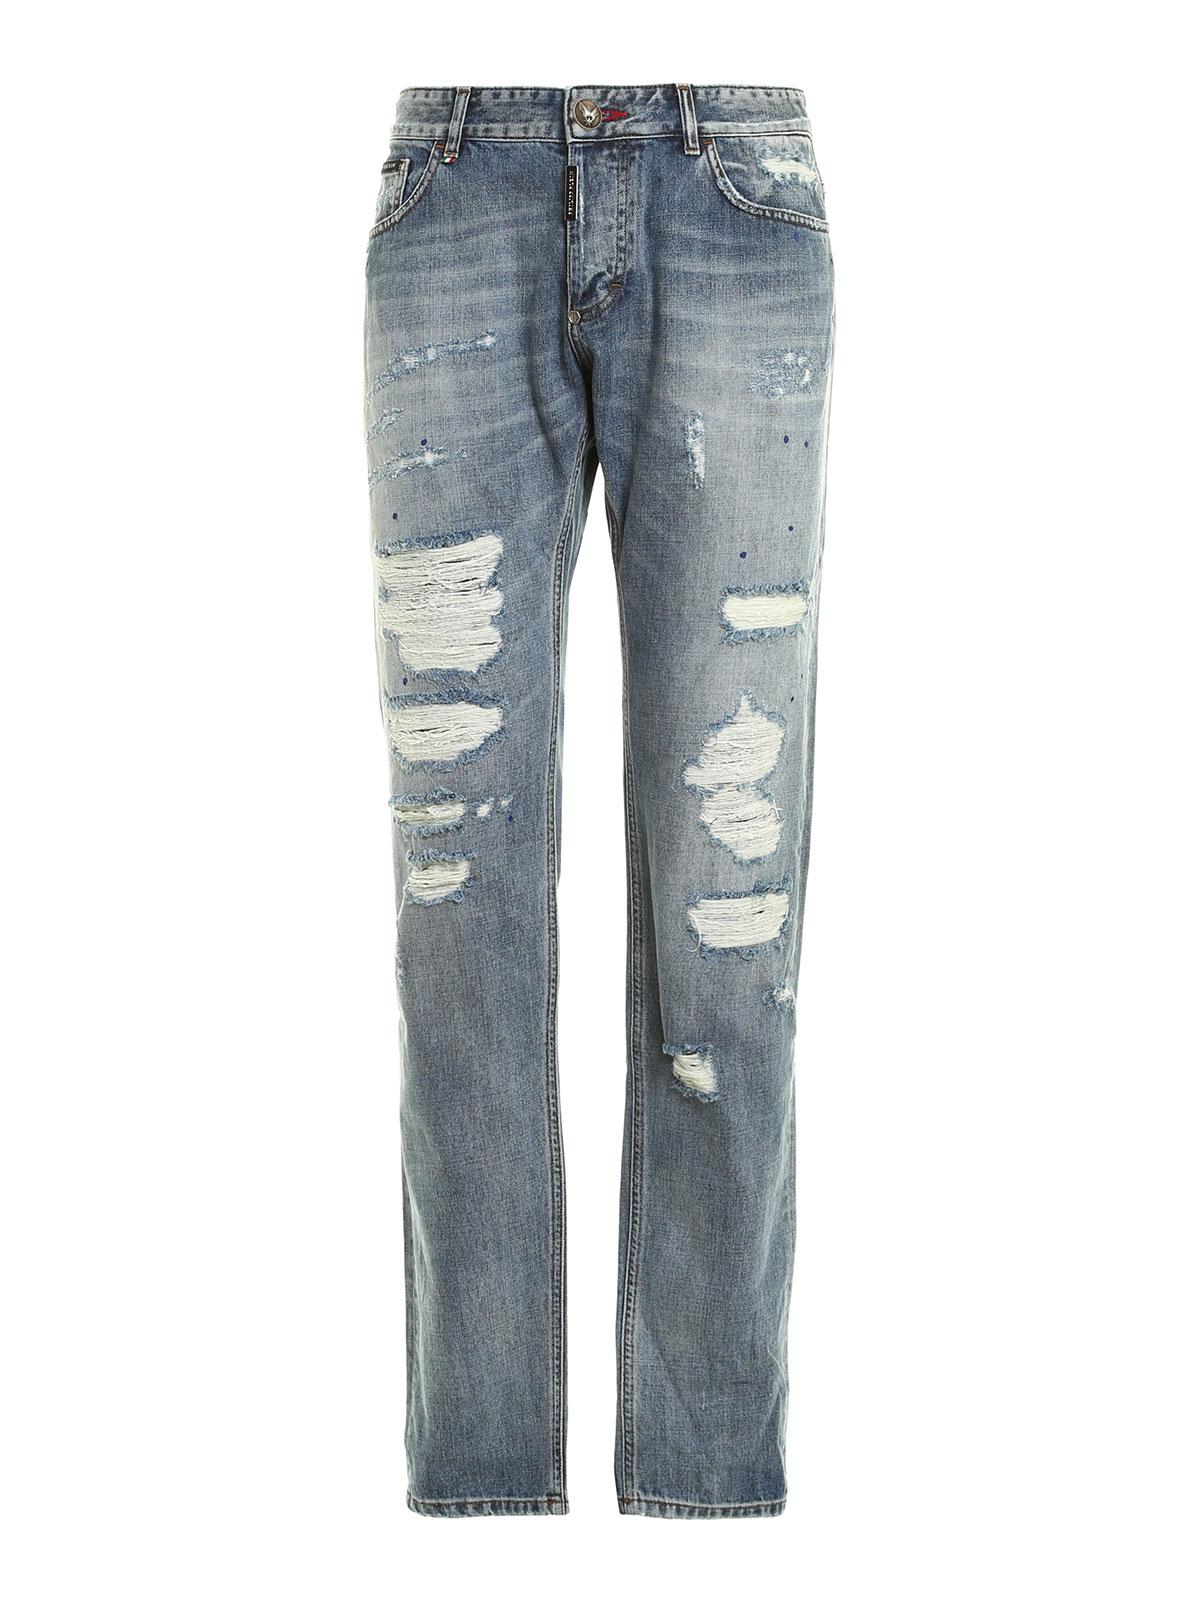 rainbow denim jeans by philipp plein straight leg jeans. Black Bedroom Furniture Sets. Home Design Ideas